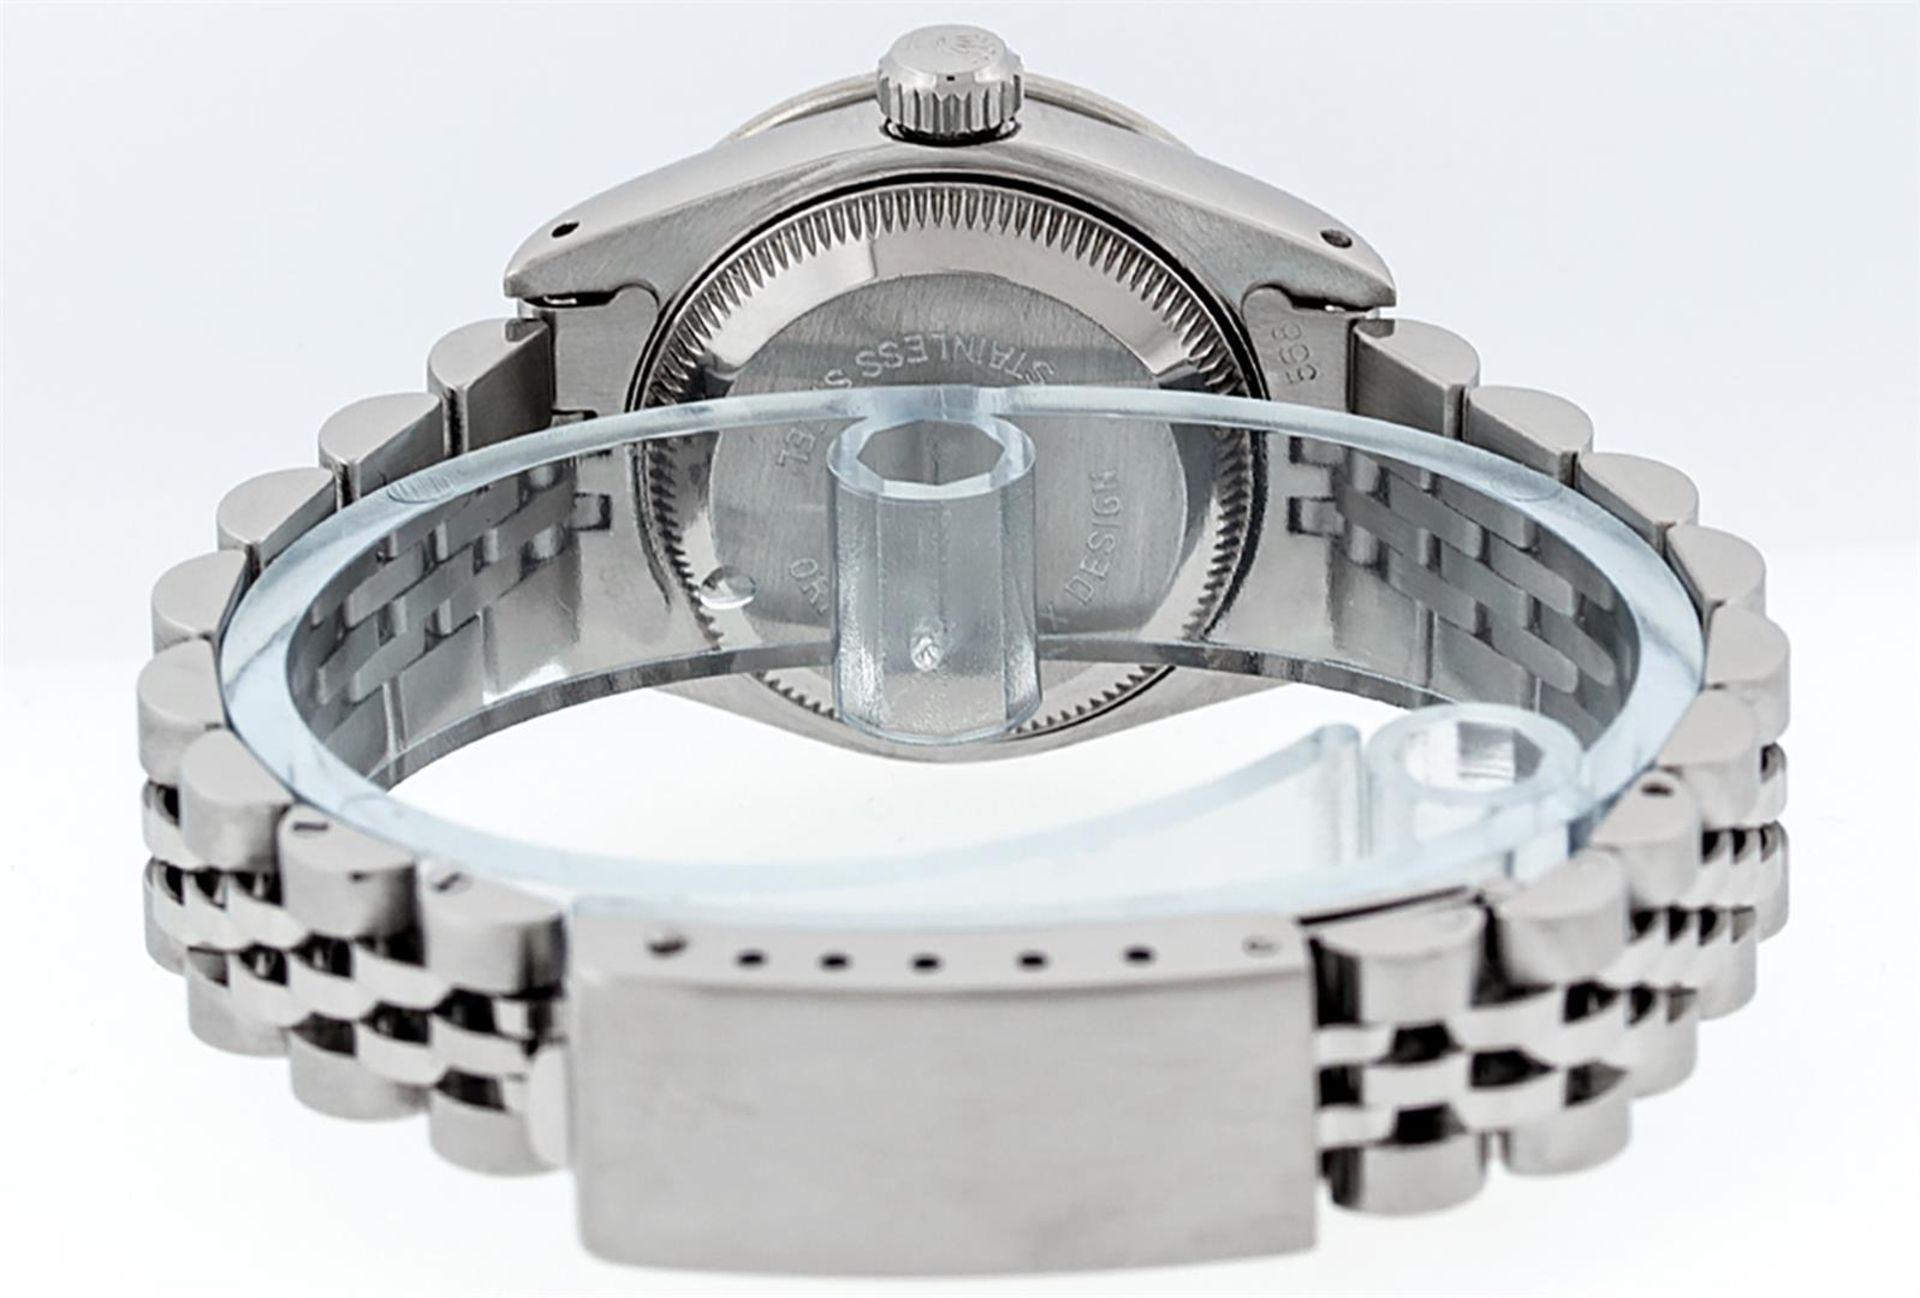 Rolex Ladies Stainless Steel 26MM Black String Diamond Lugs Datejust Wristwatch - Image 8 of 9